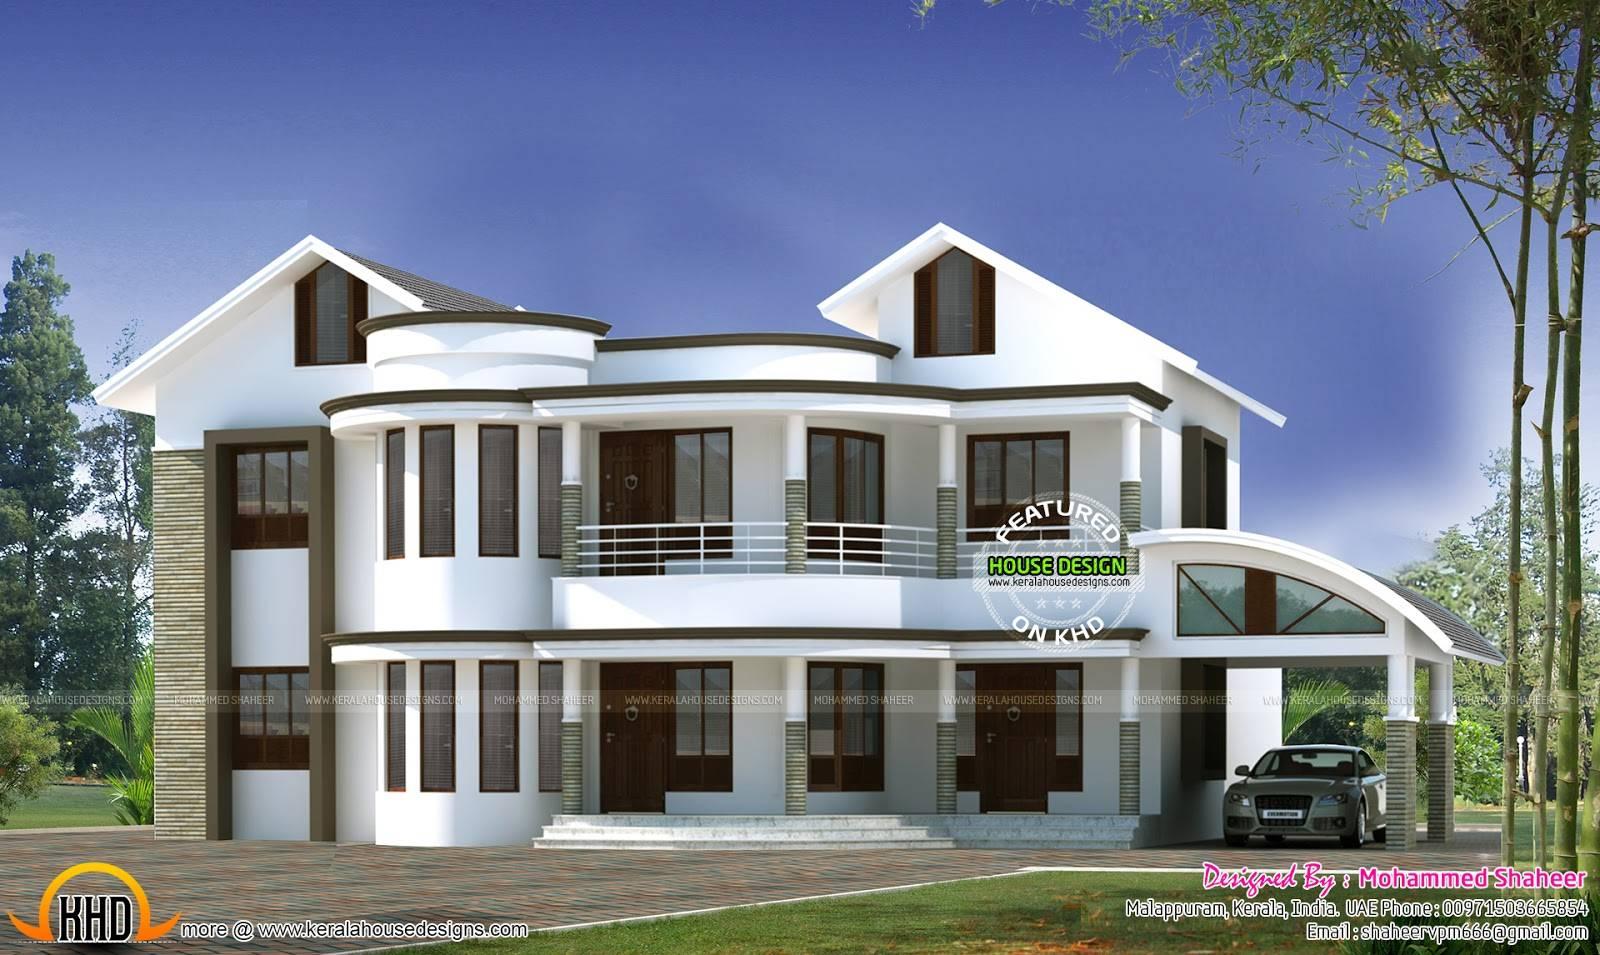 Mixed Roof Modern Home Kerala Design Floor Plans House Plans 3546